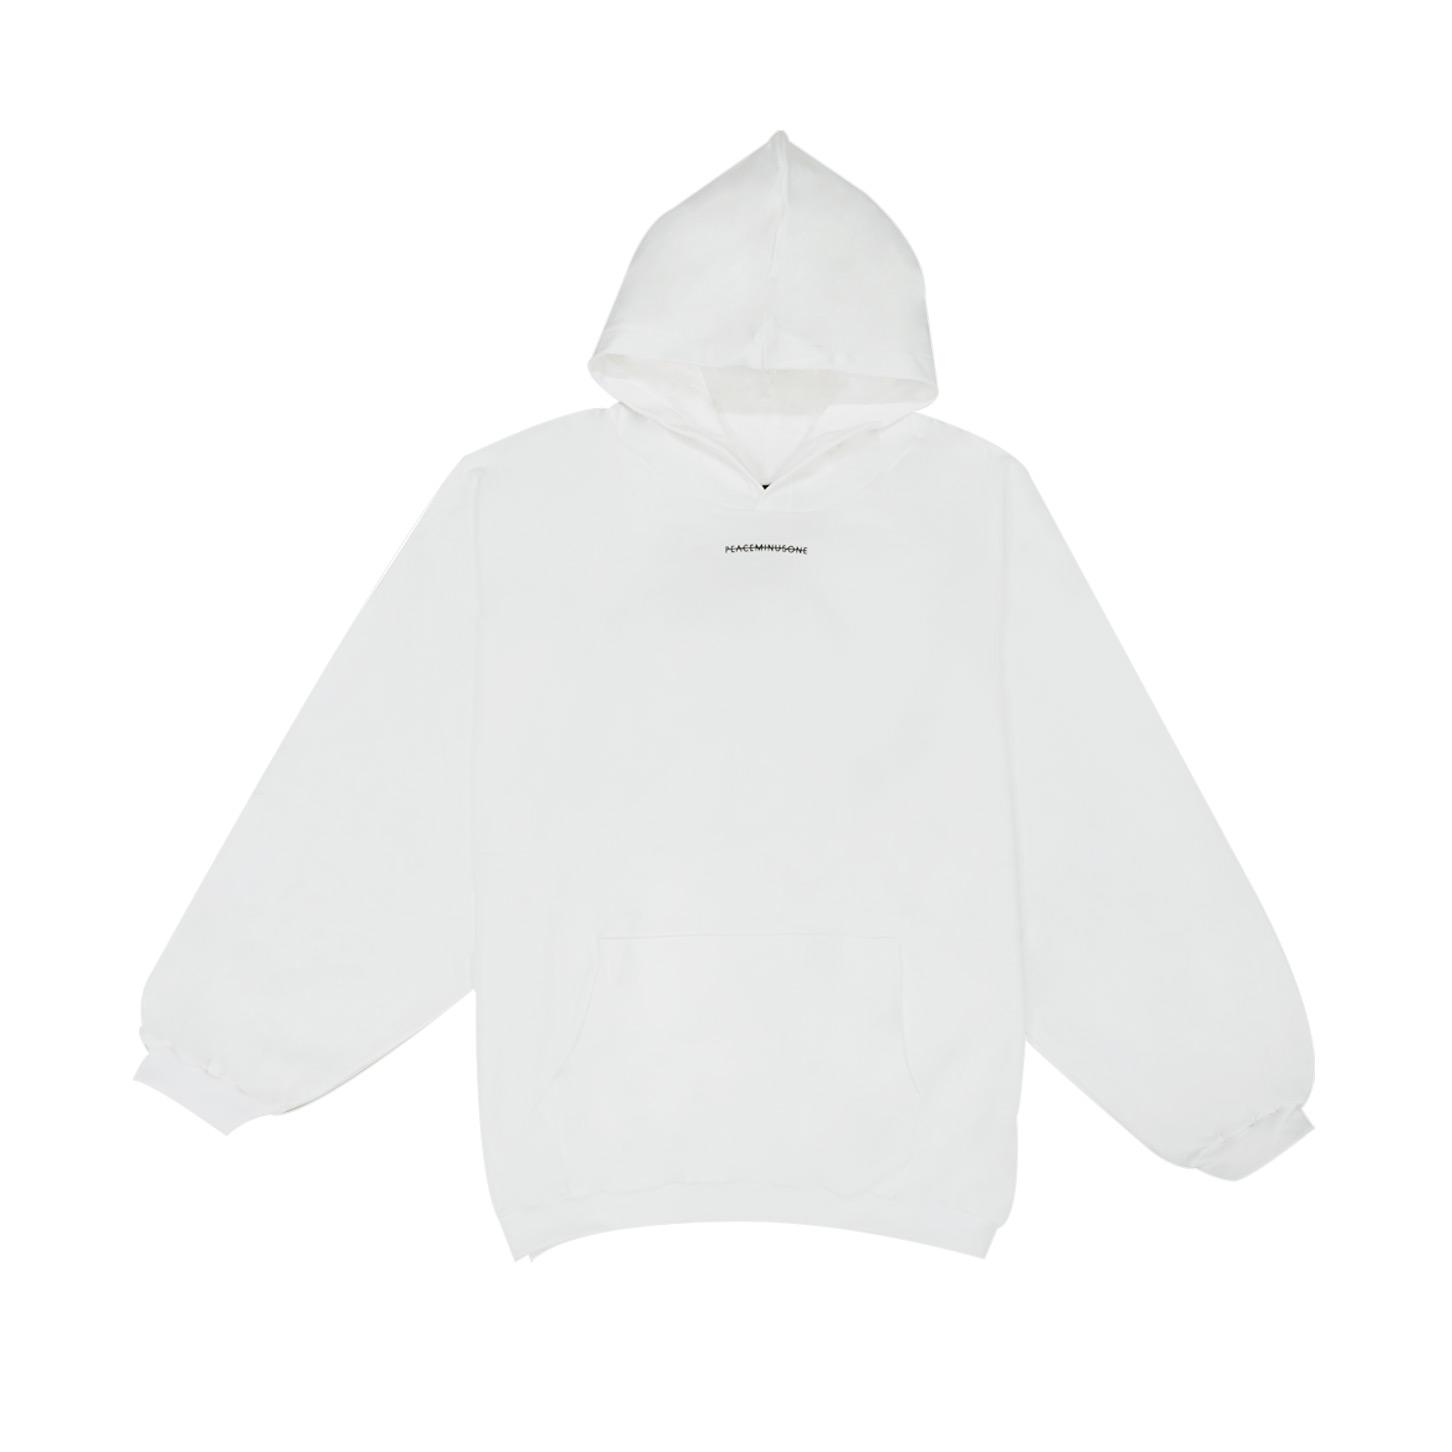 Peaceminusone Hoodie #1 White